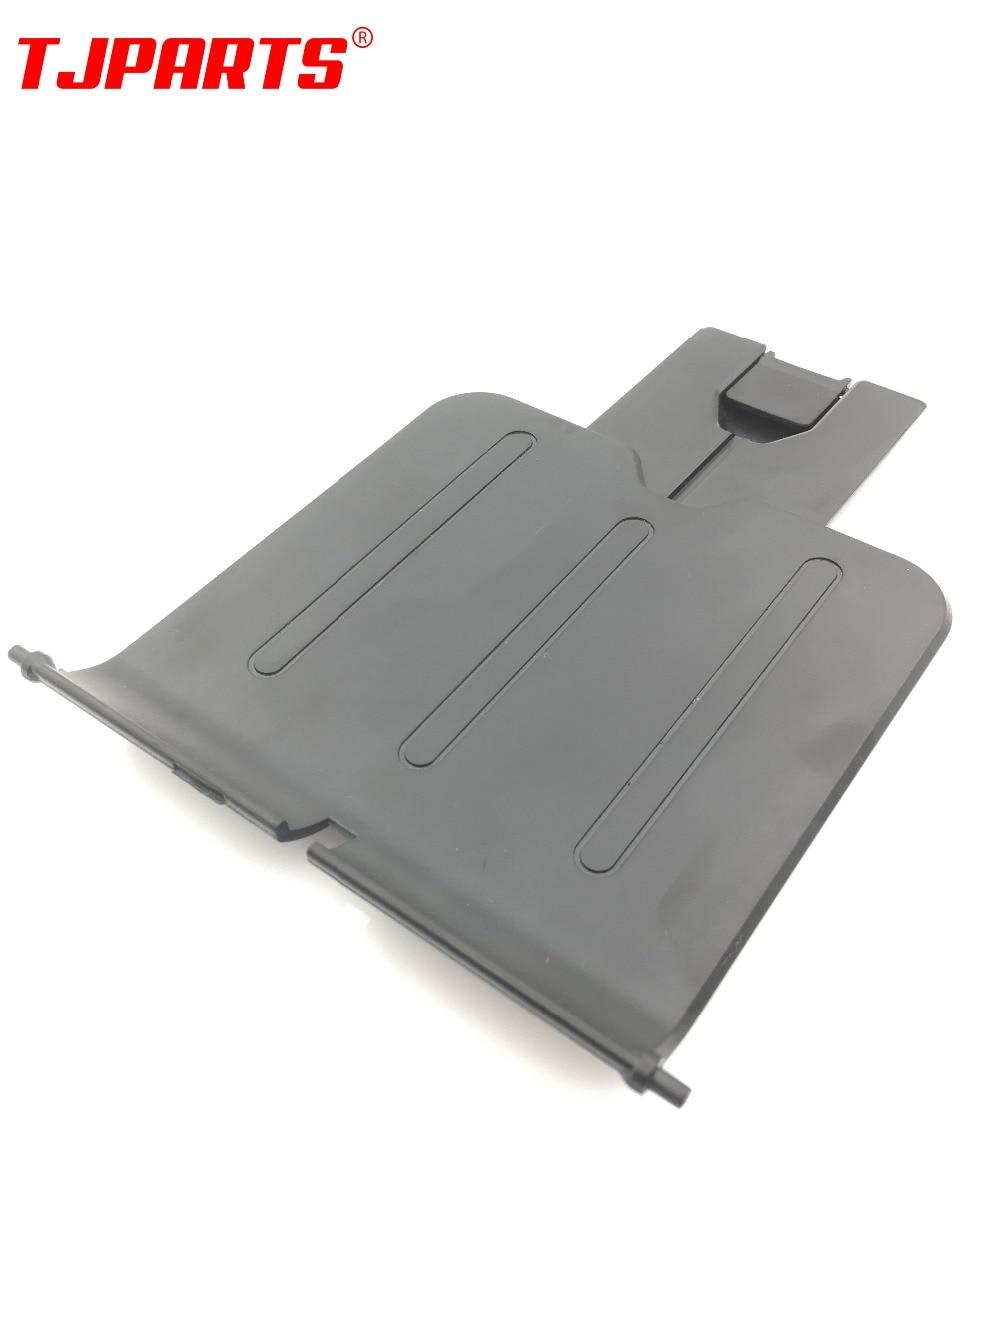 1X RM1-6903-000 Бумага Выход лоток для hp P1102 P1102w P1102s M1536 P1005 P1006 P1007 P1008 P1106 P1108 P1109 P1607